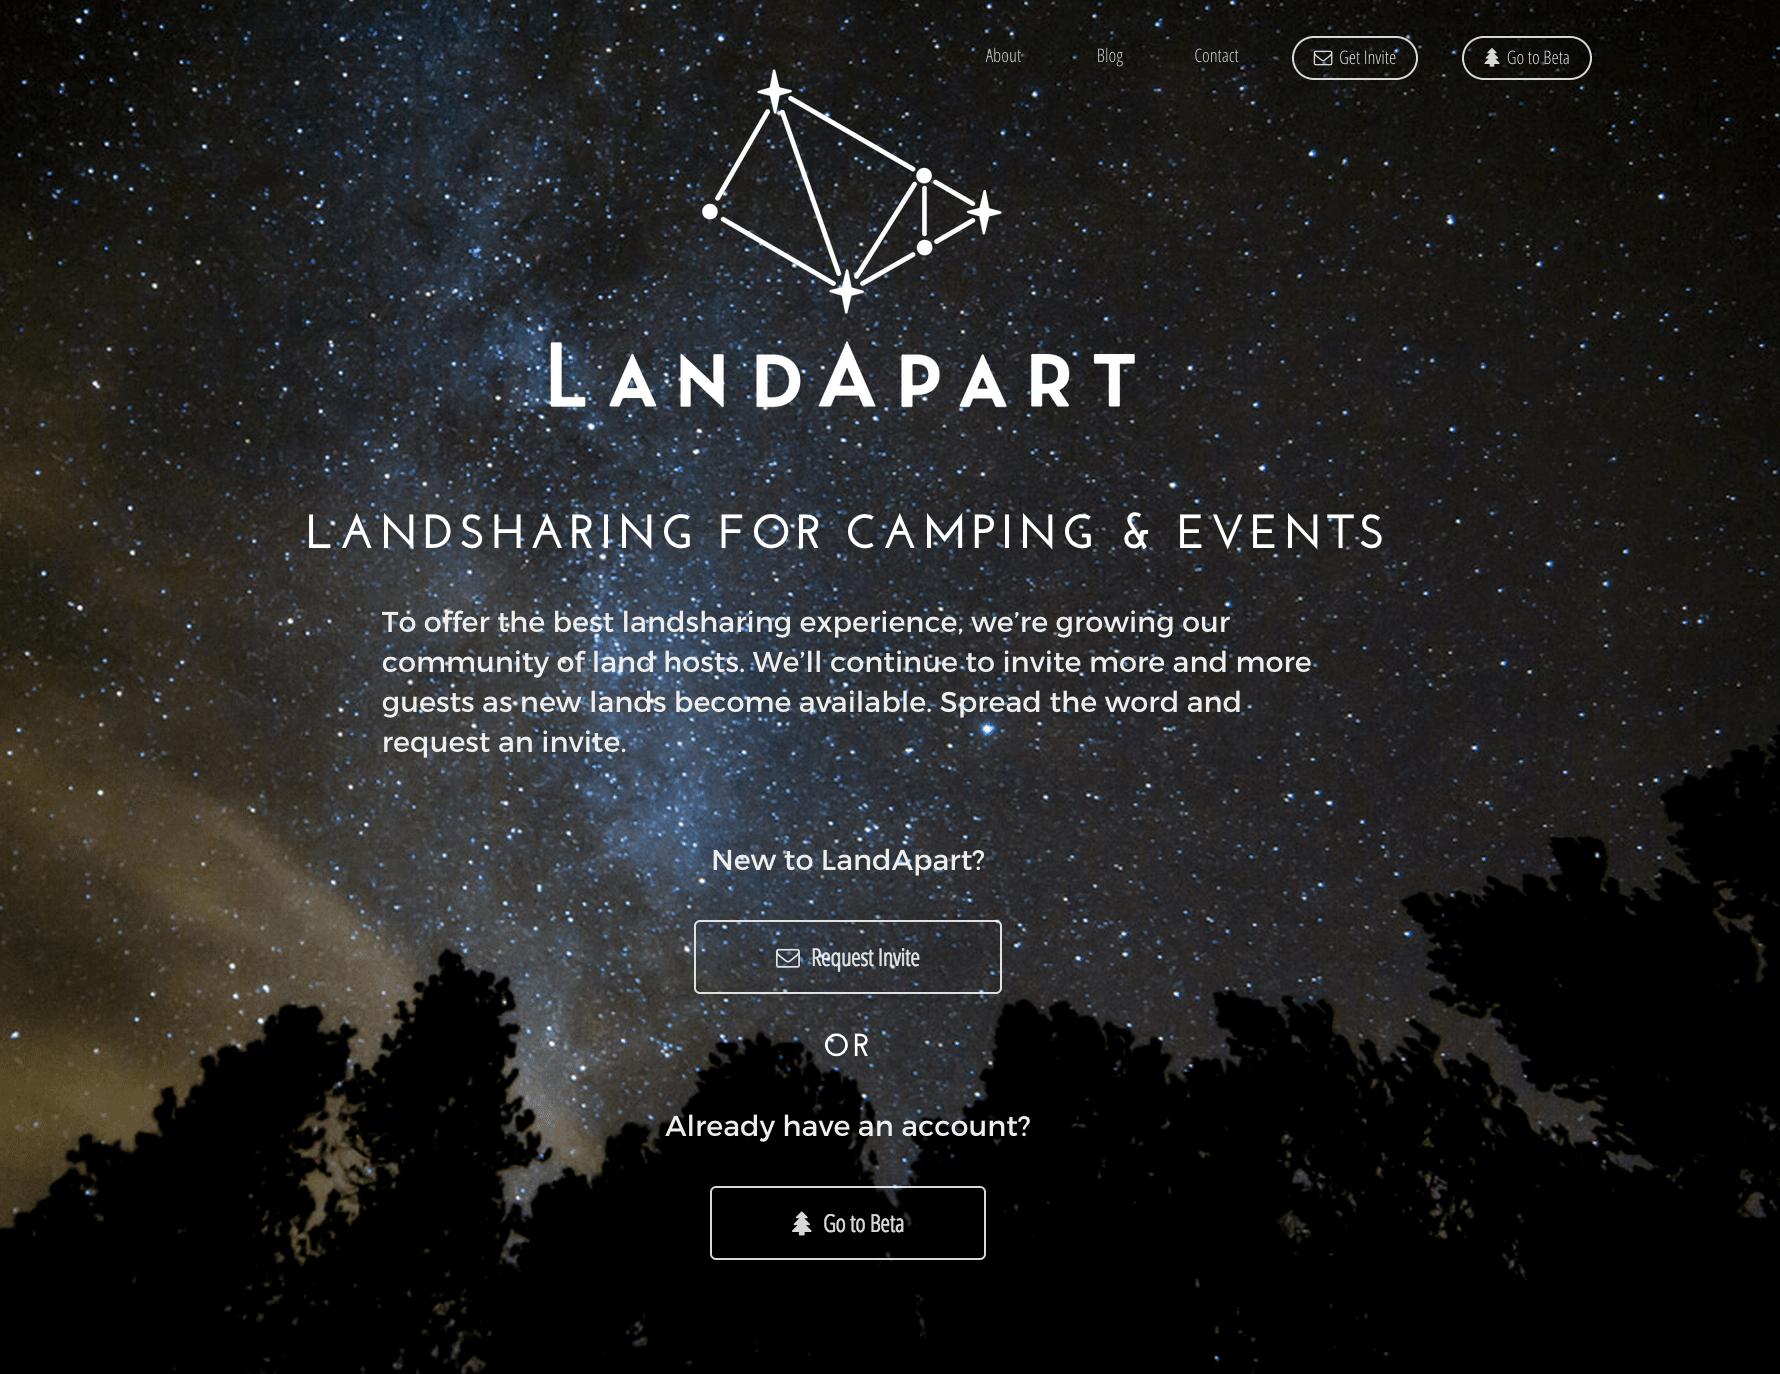 LandApart_—_Invite